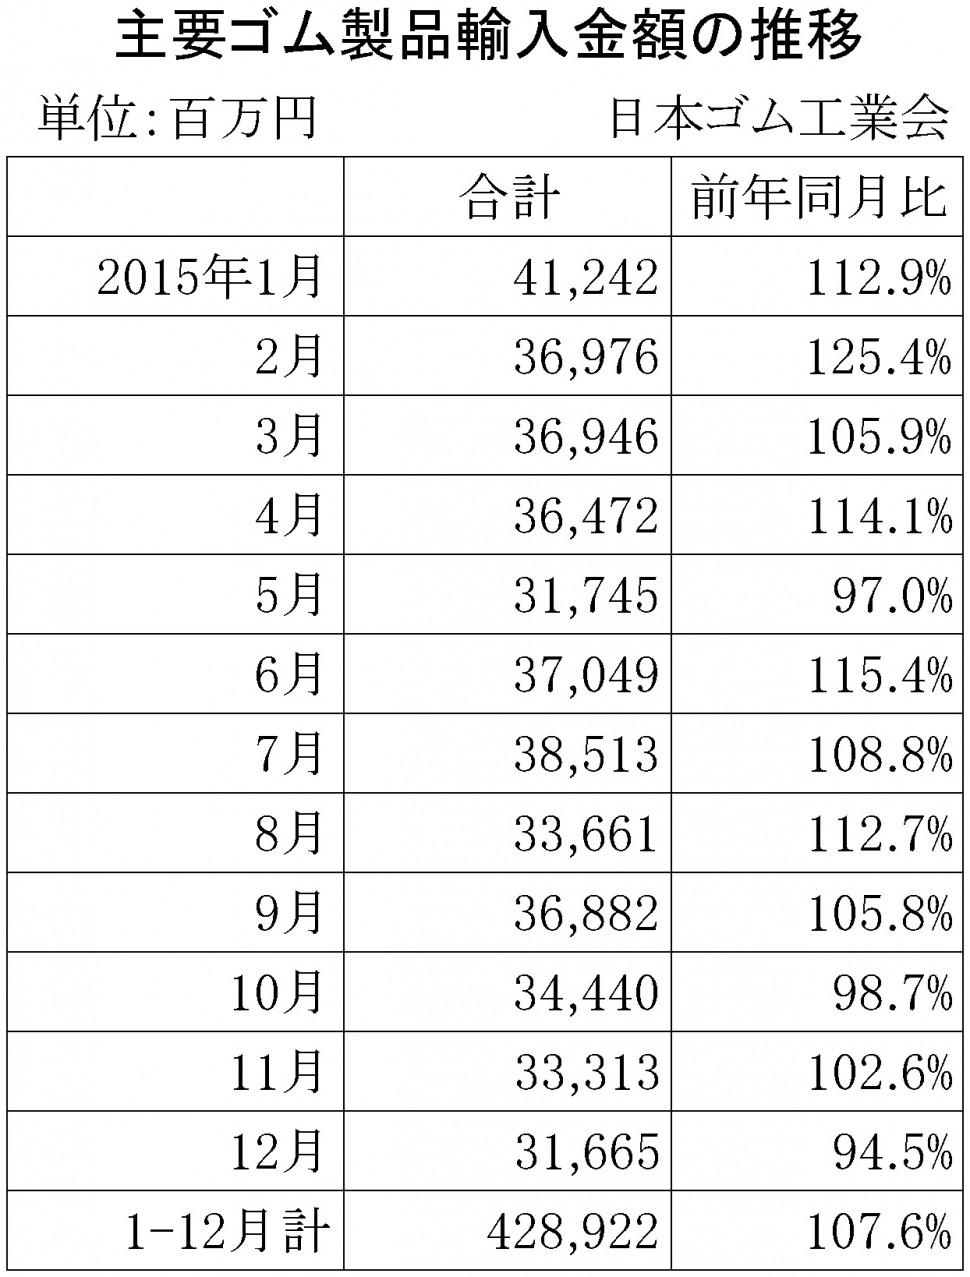 2015年12月ゴム製品輸入金額